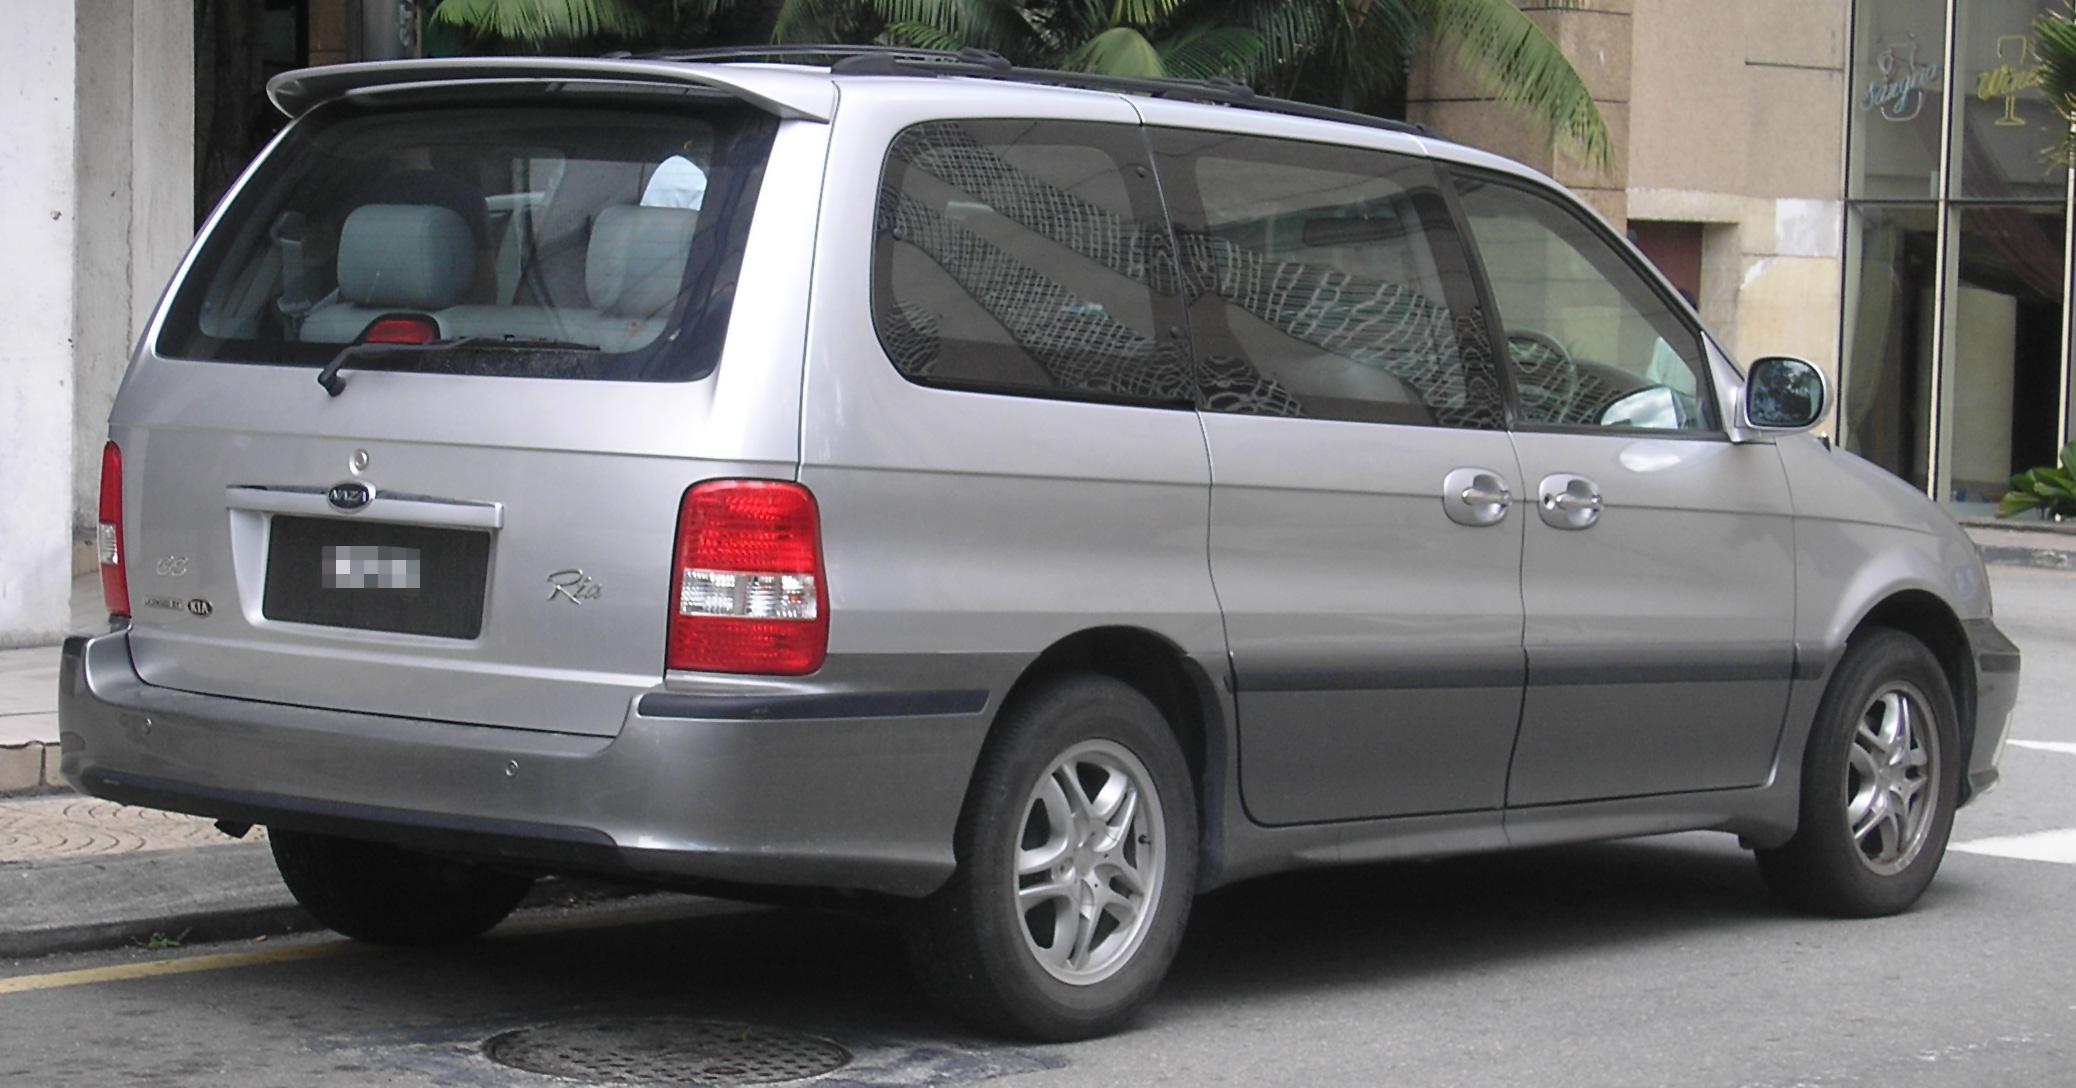 File:Naza <b>Ria</b> (first generation) (rear), Kuala Lumpur.jpg ...